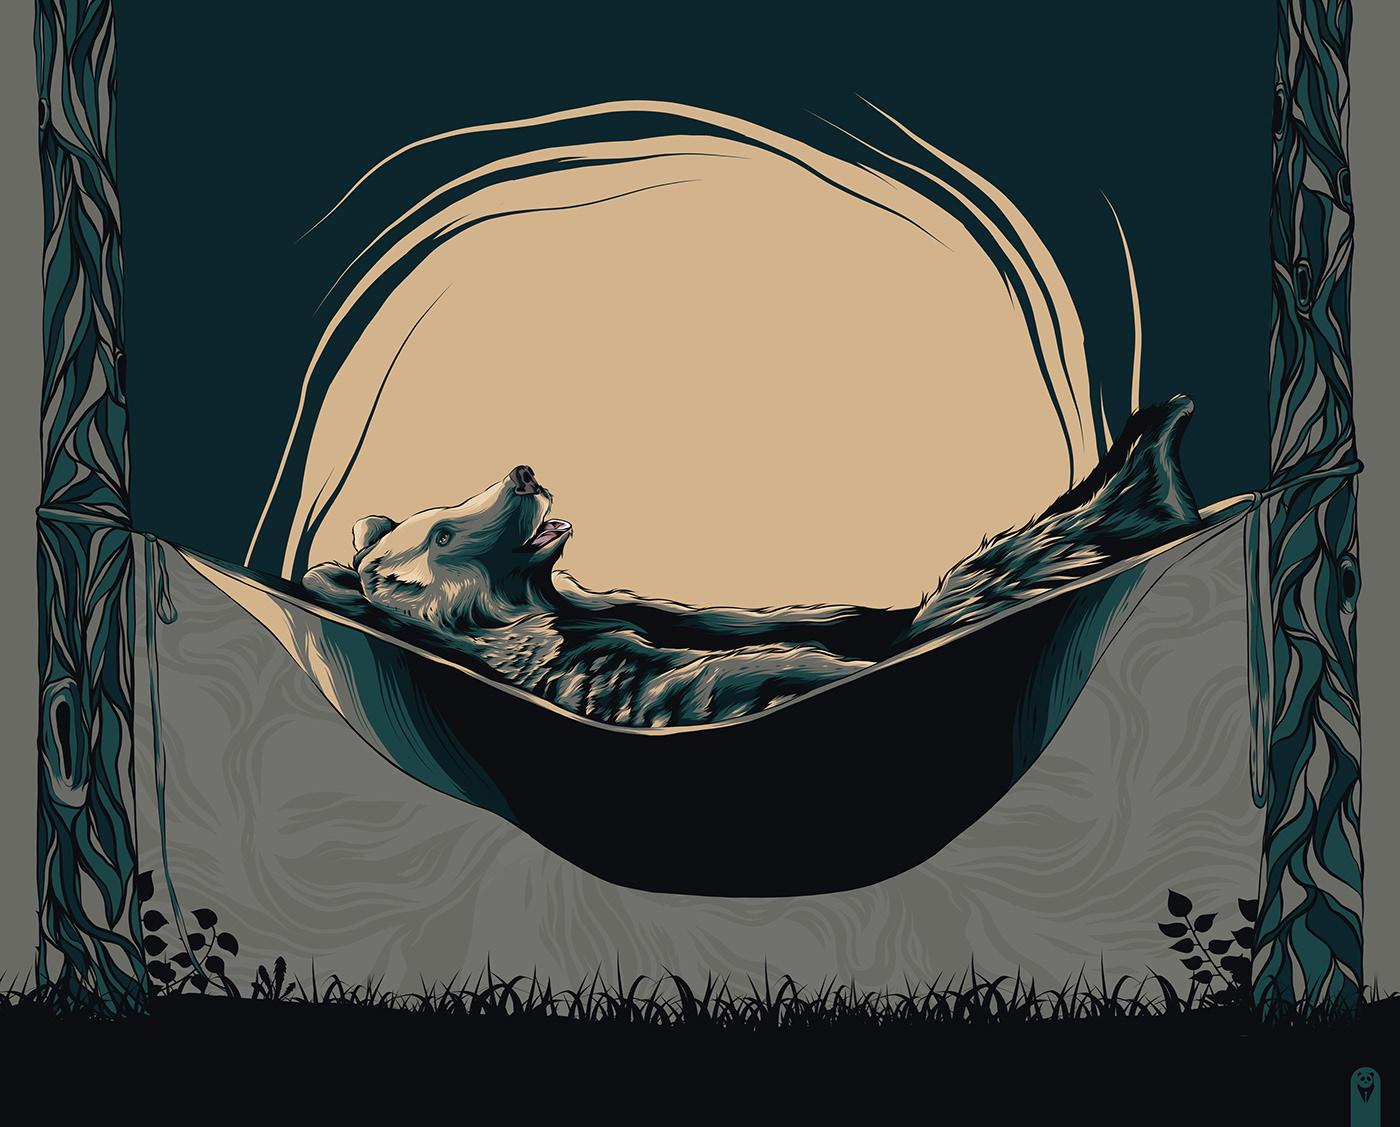 Grizzly Bear Sleeping in a Hammock